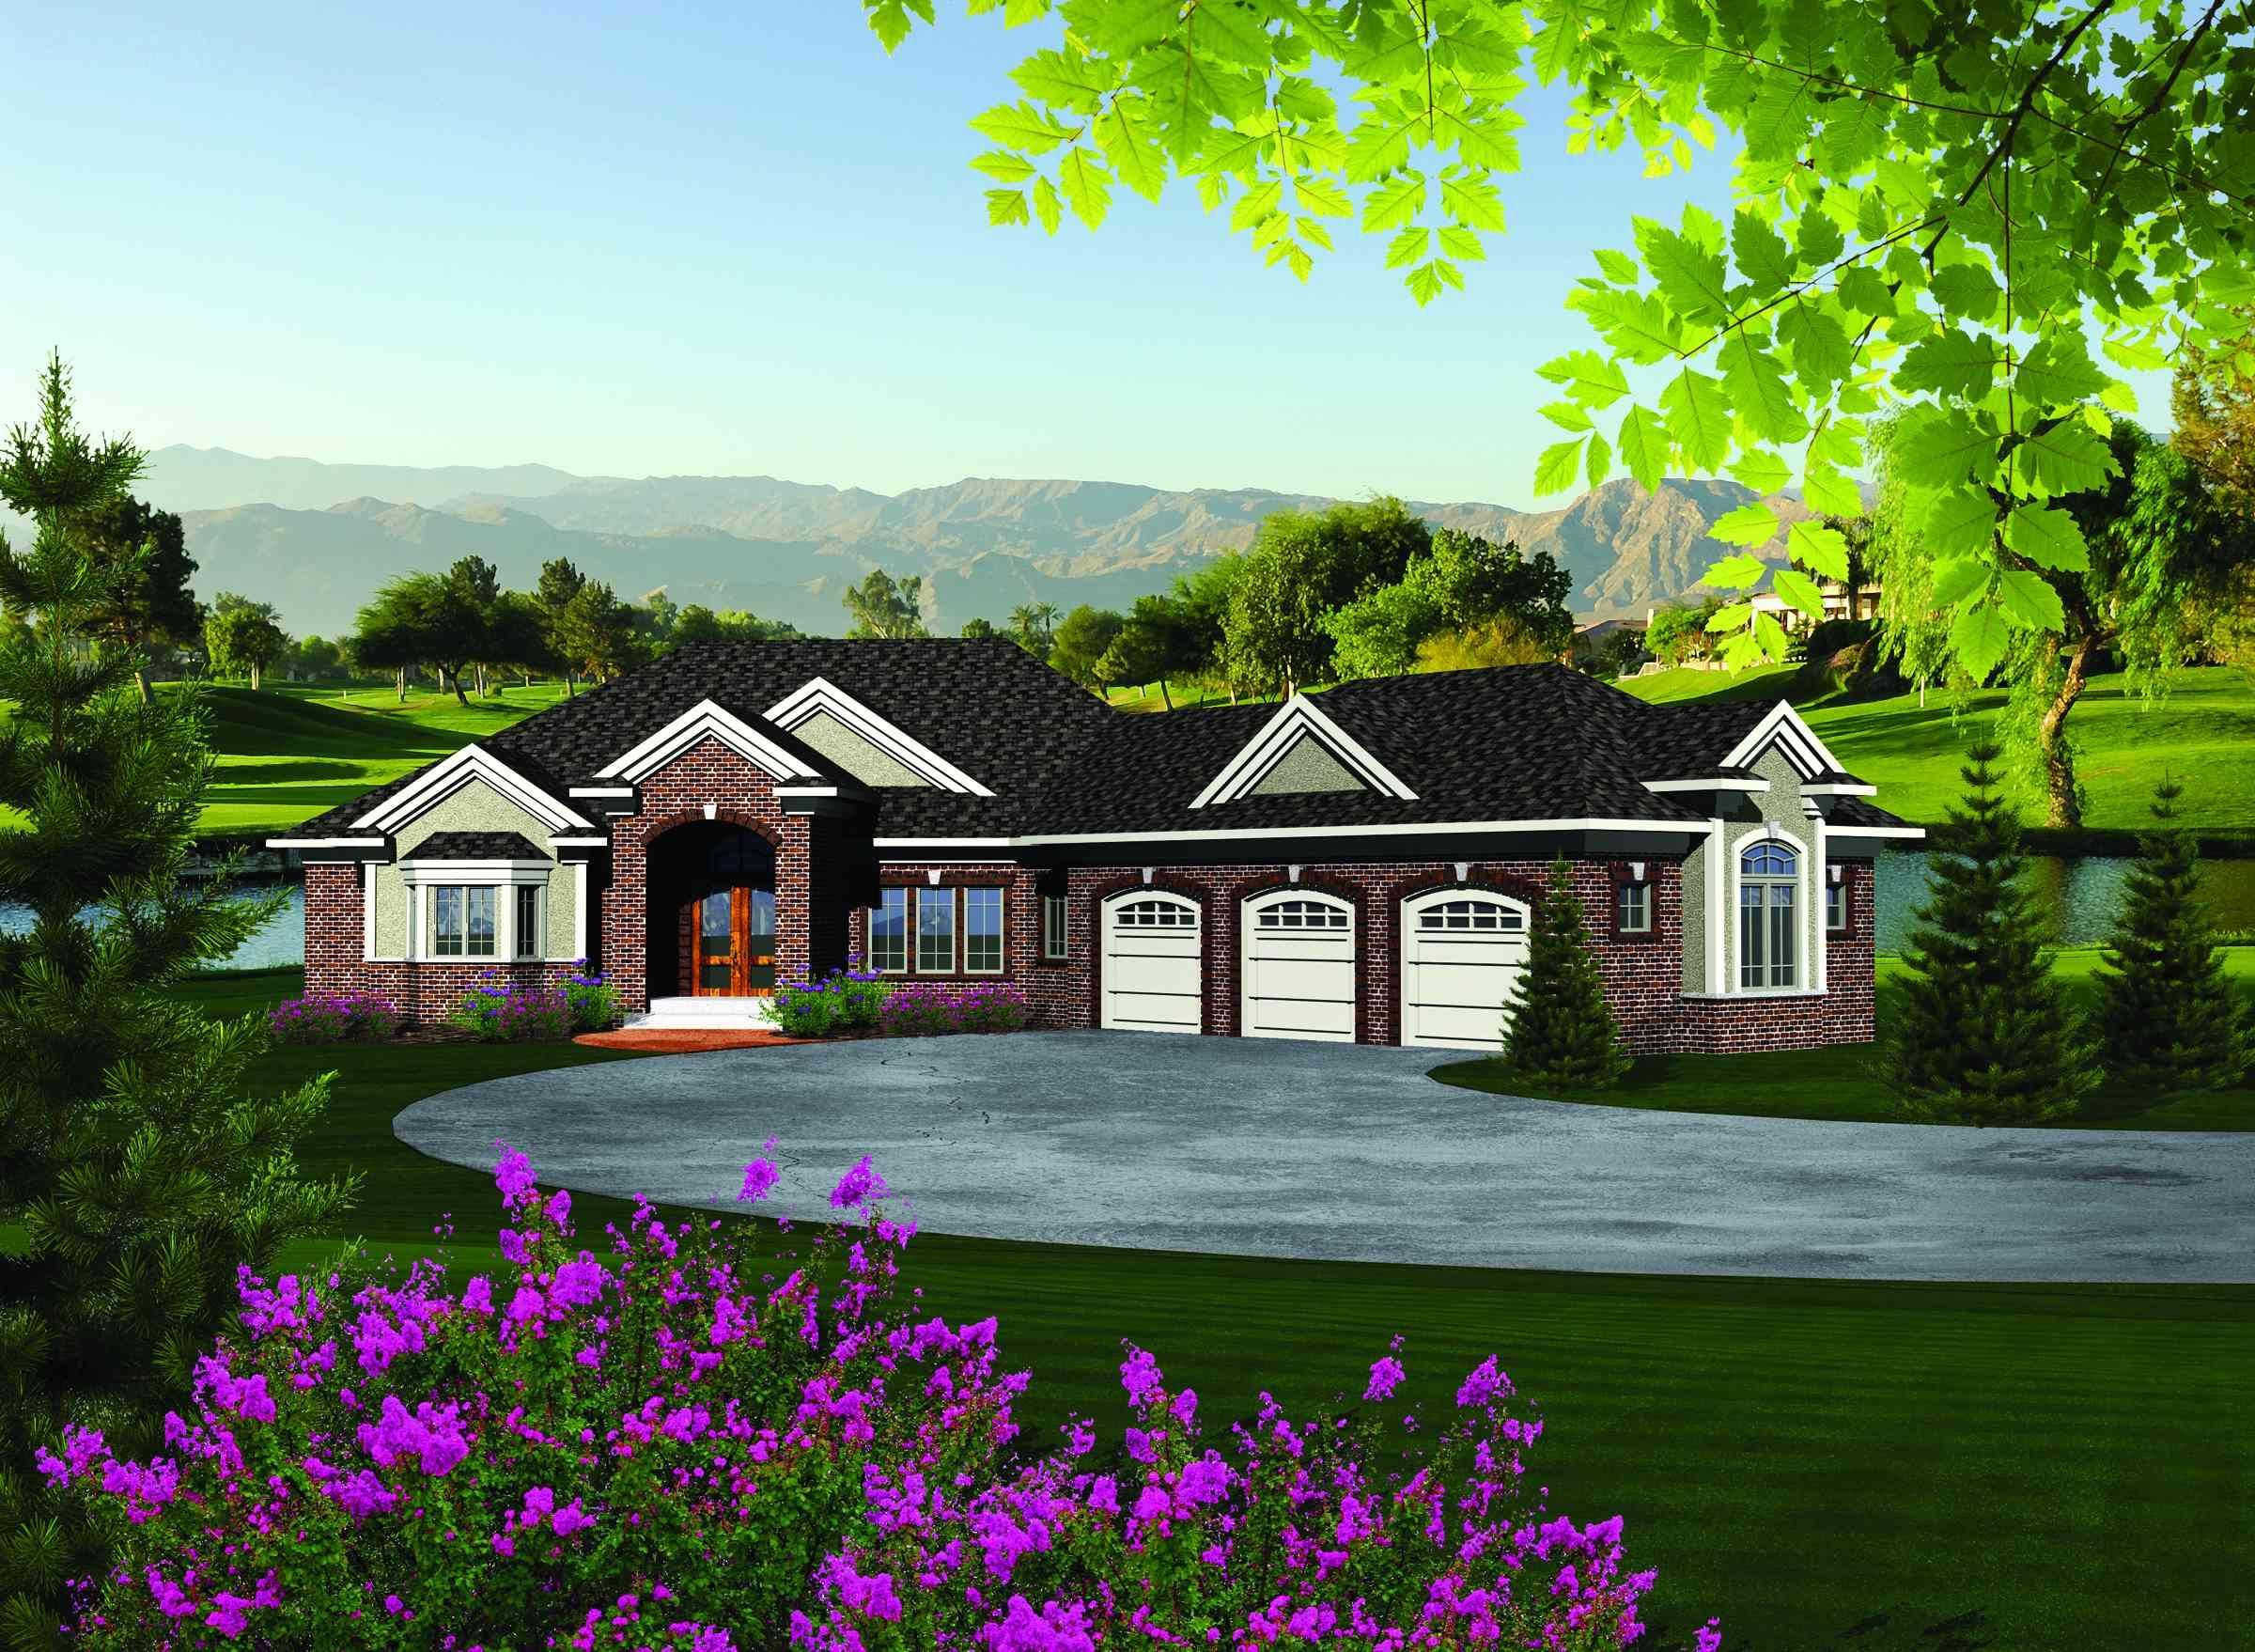 Plan AH Ranch Home Plan with Walkout Basement